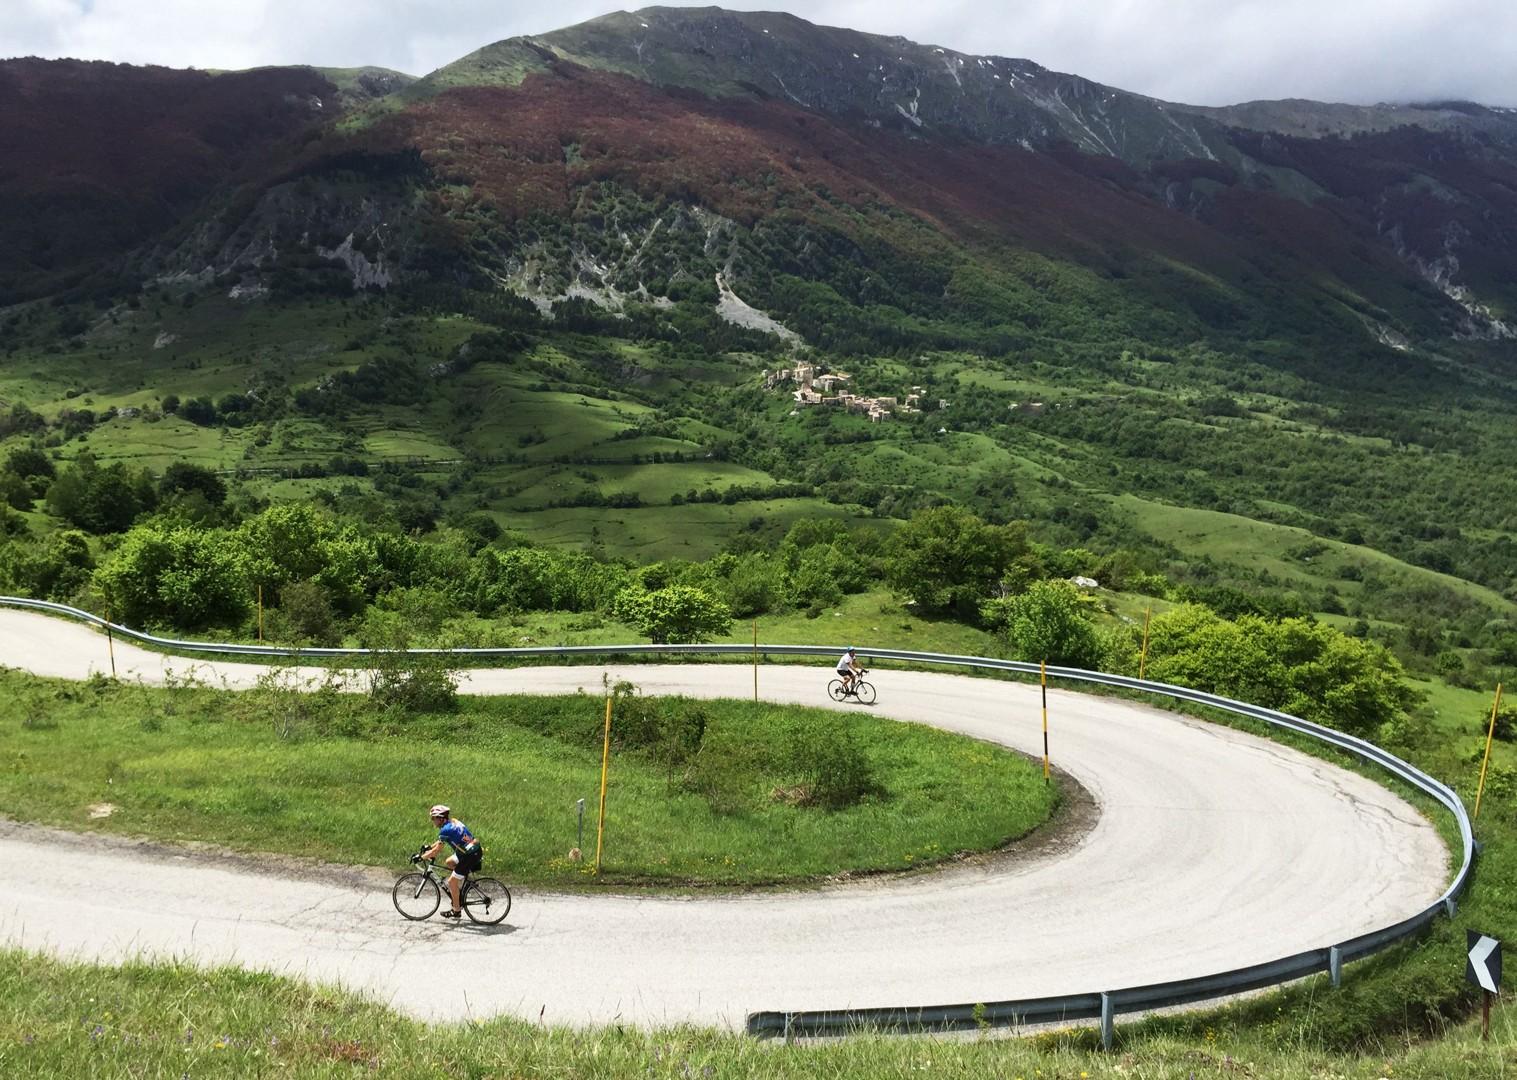 guided-road-cycling-holiday-italy-abruzzo-appennini-dabruzzo.JPG - Italy - Abruzzo - Appennini d'Abruzzo - Guided Road Cycling Holiday - Road Cycling